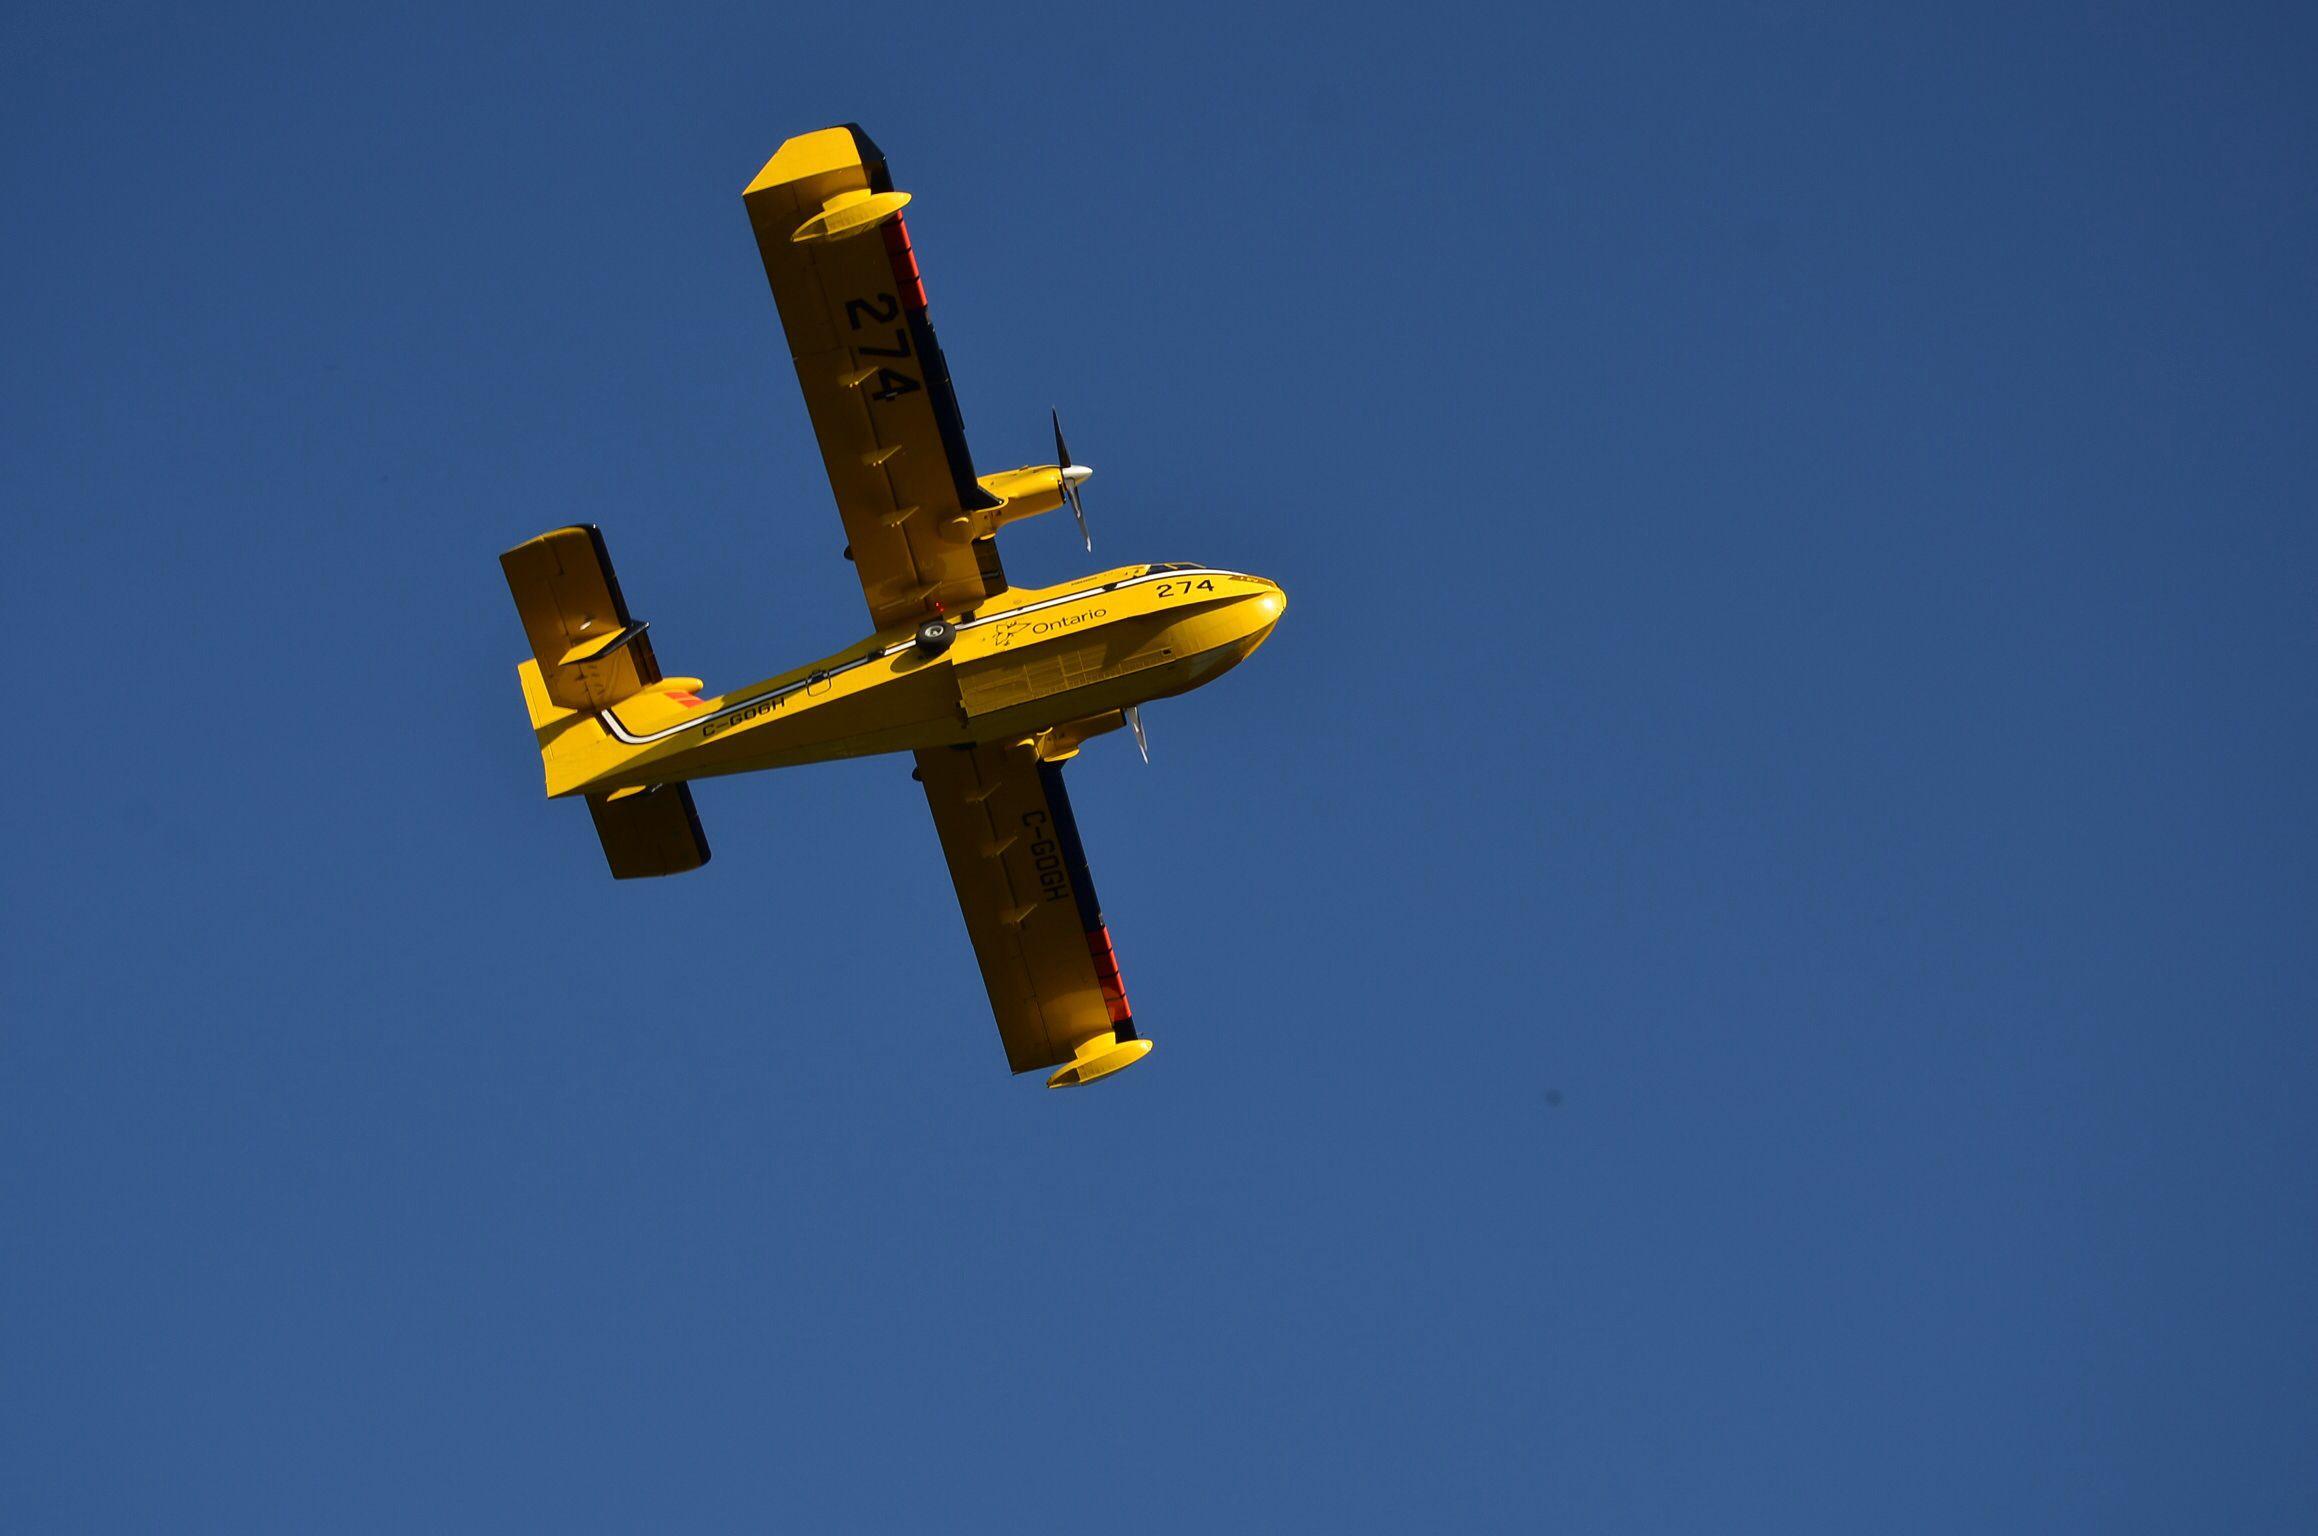 Colour Me Christal Photography, airplane https://www.flickr.com/photos/thegirlnextdoor0666/